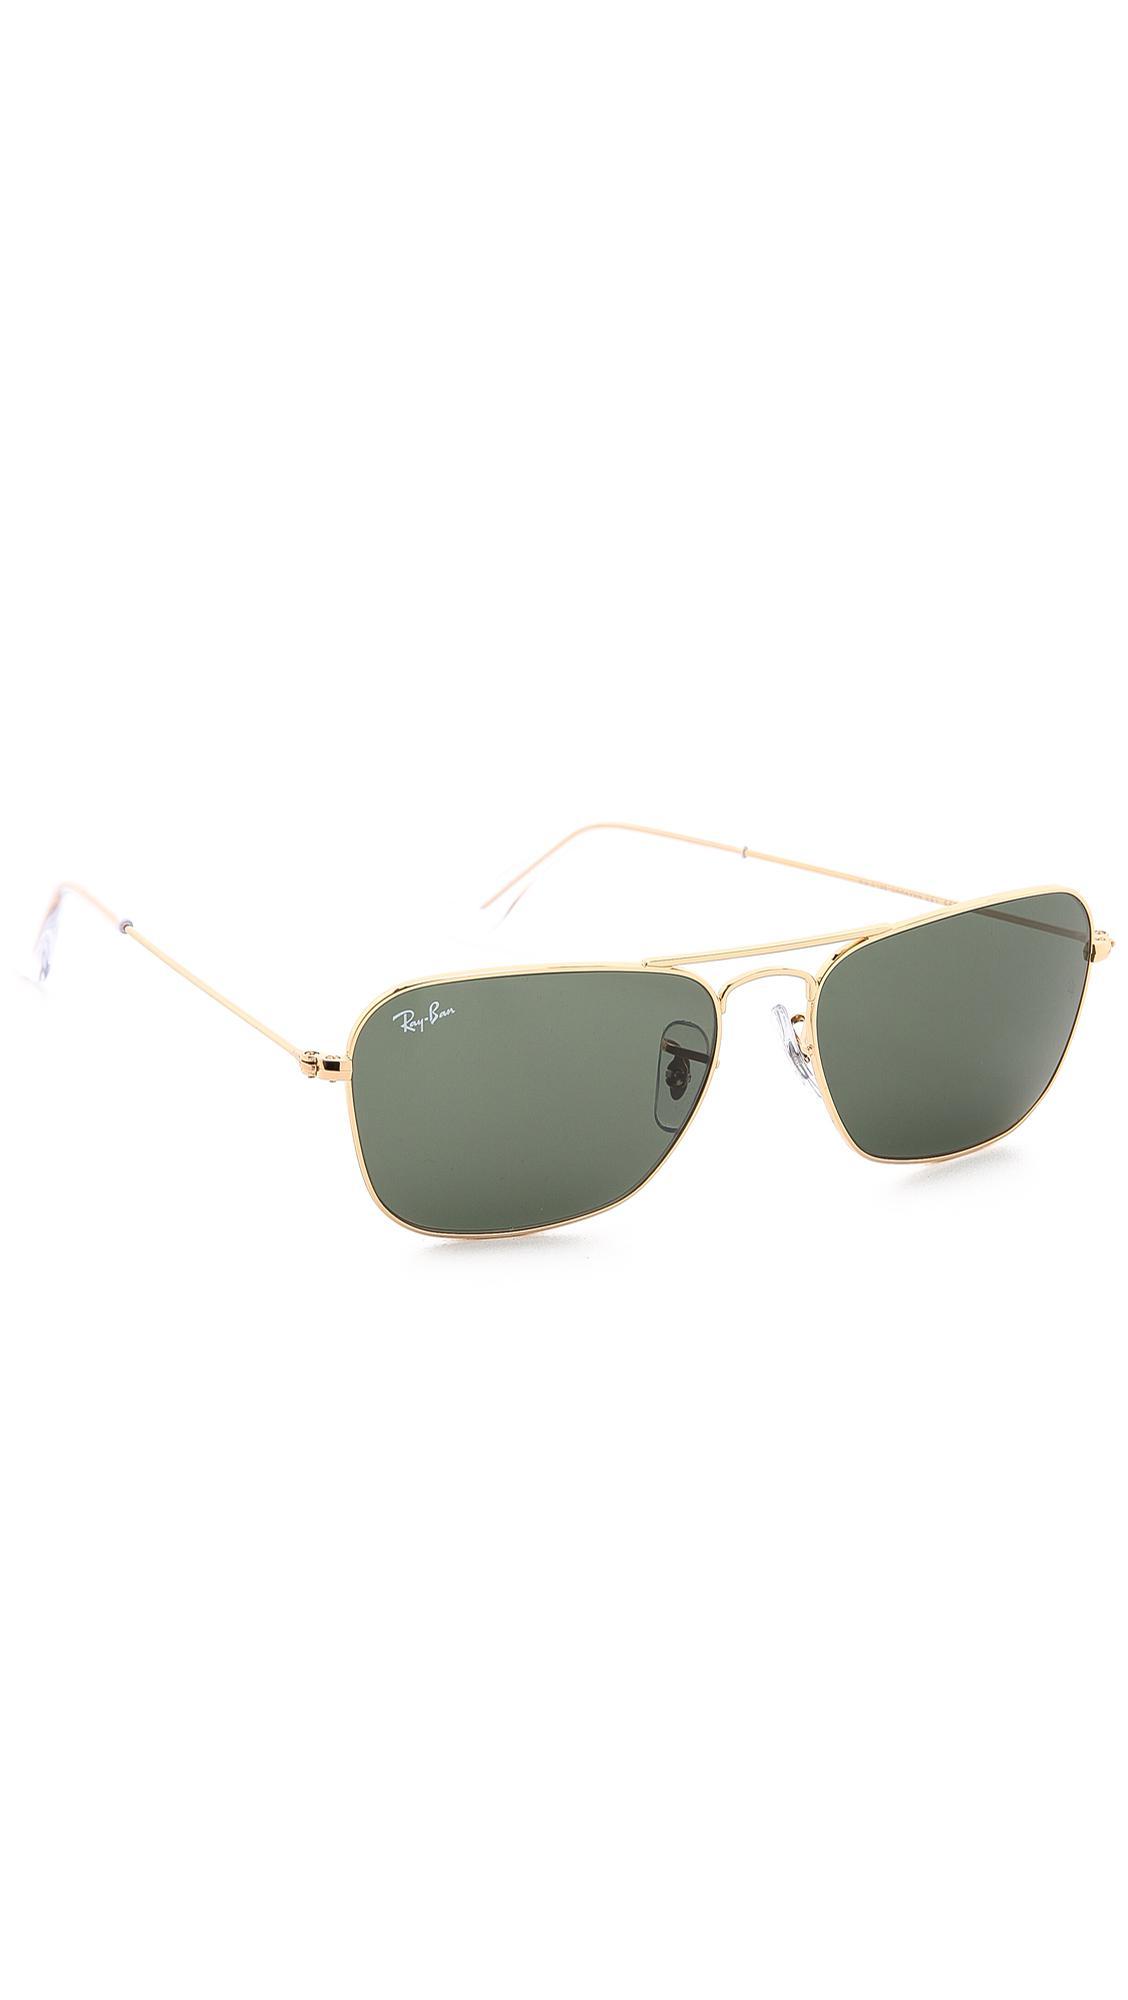 fb256ec4ef Ray-Ban Caravan Sunglasses in Green - Lyst